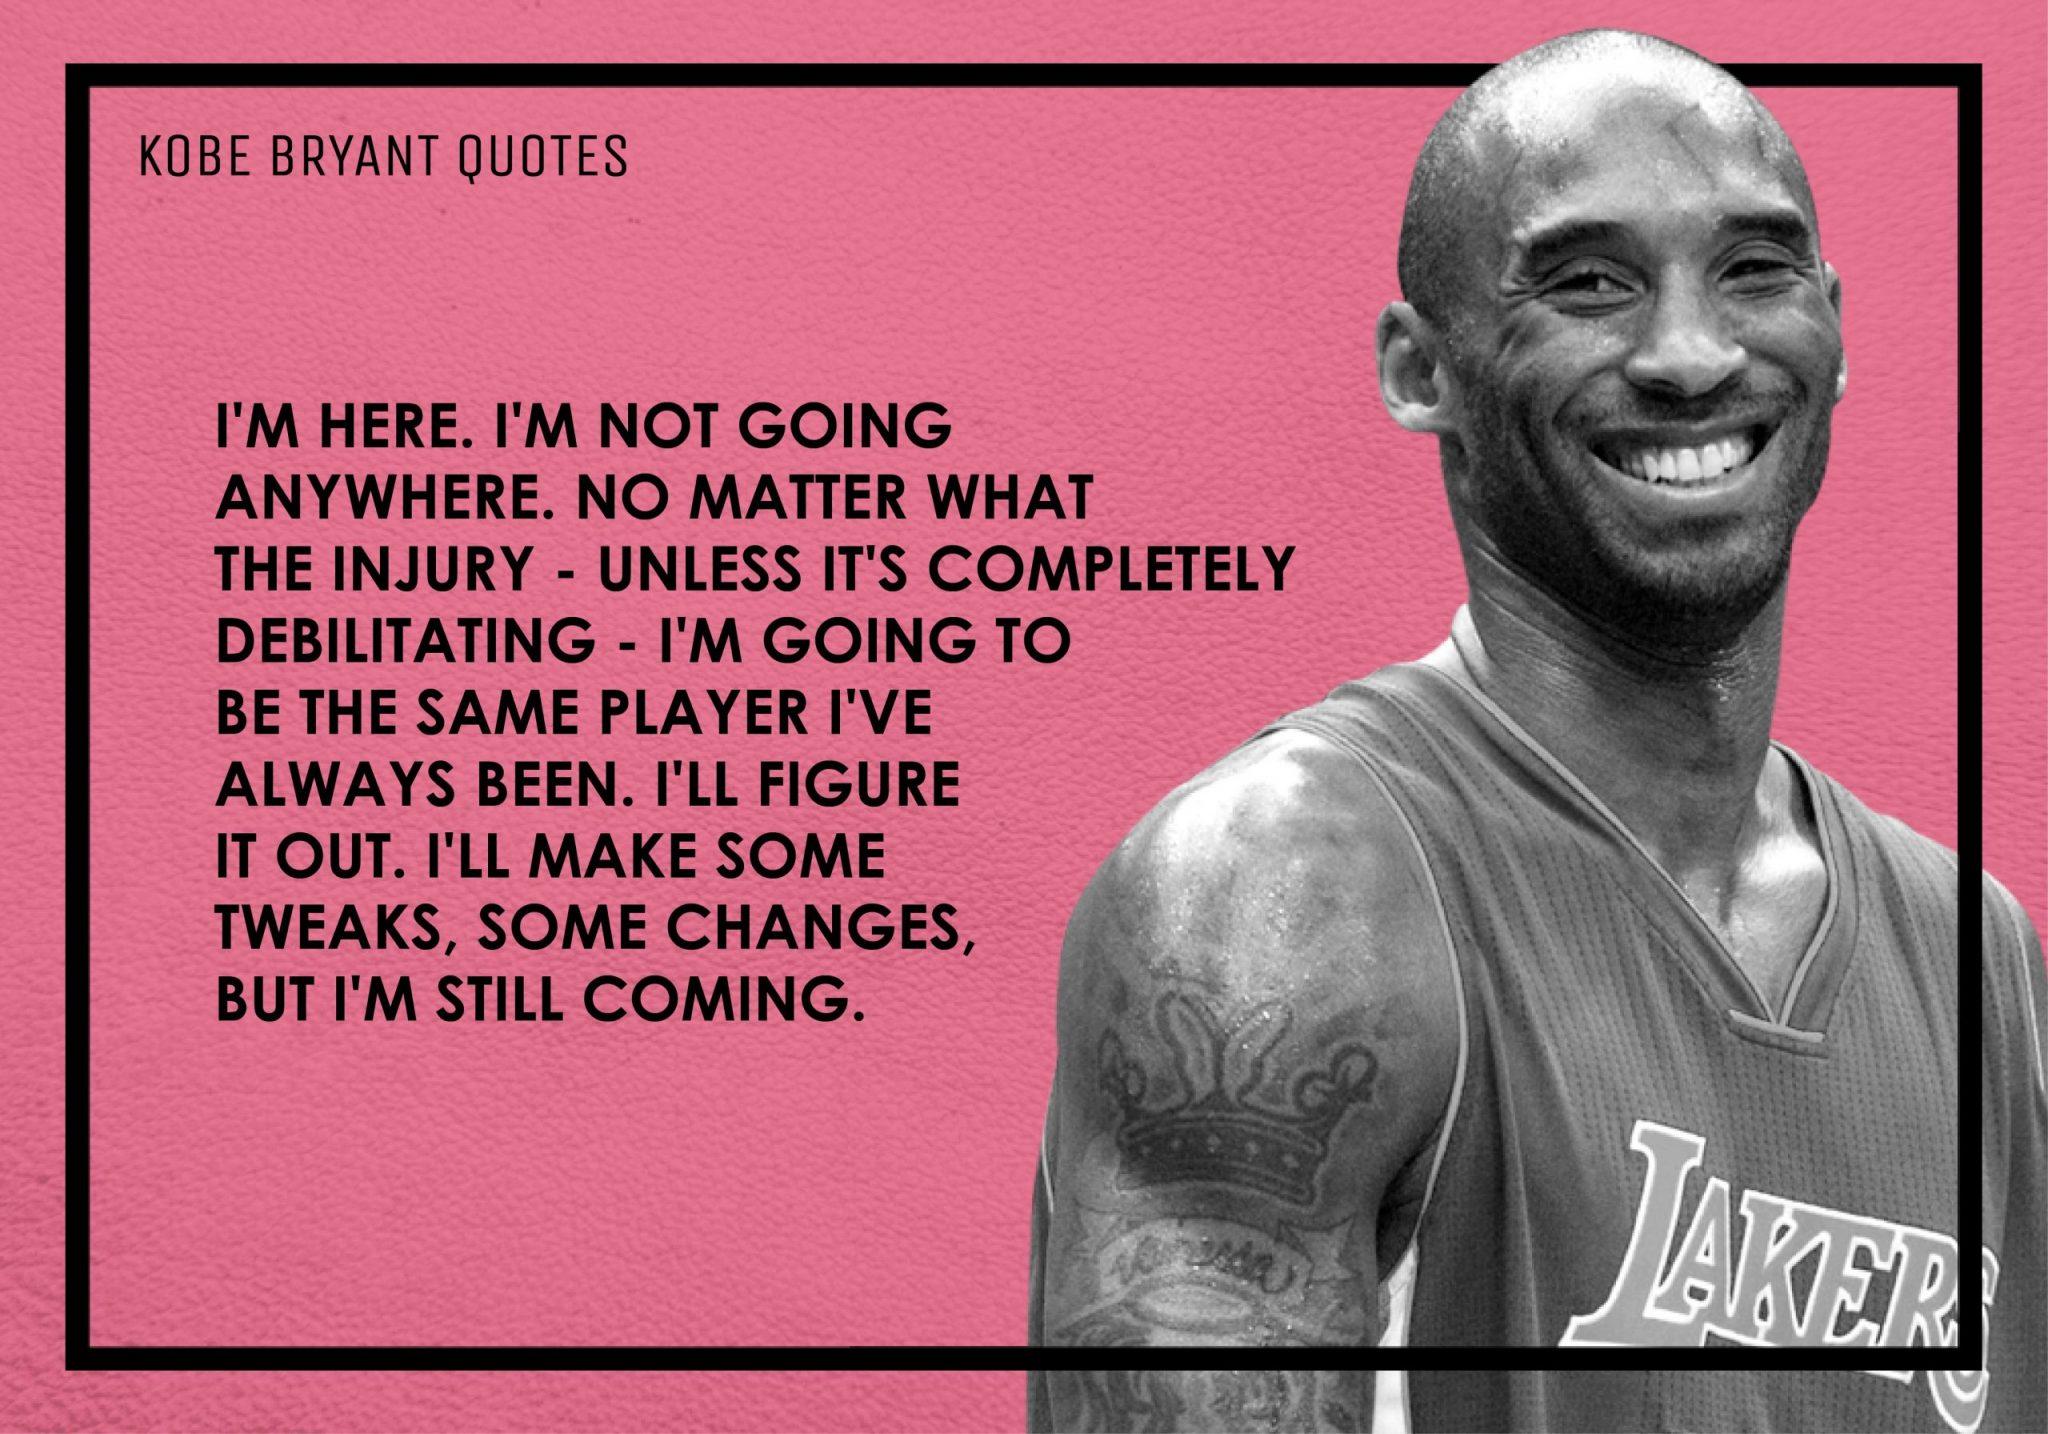 Kobe Bryant Quotes (10)